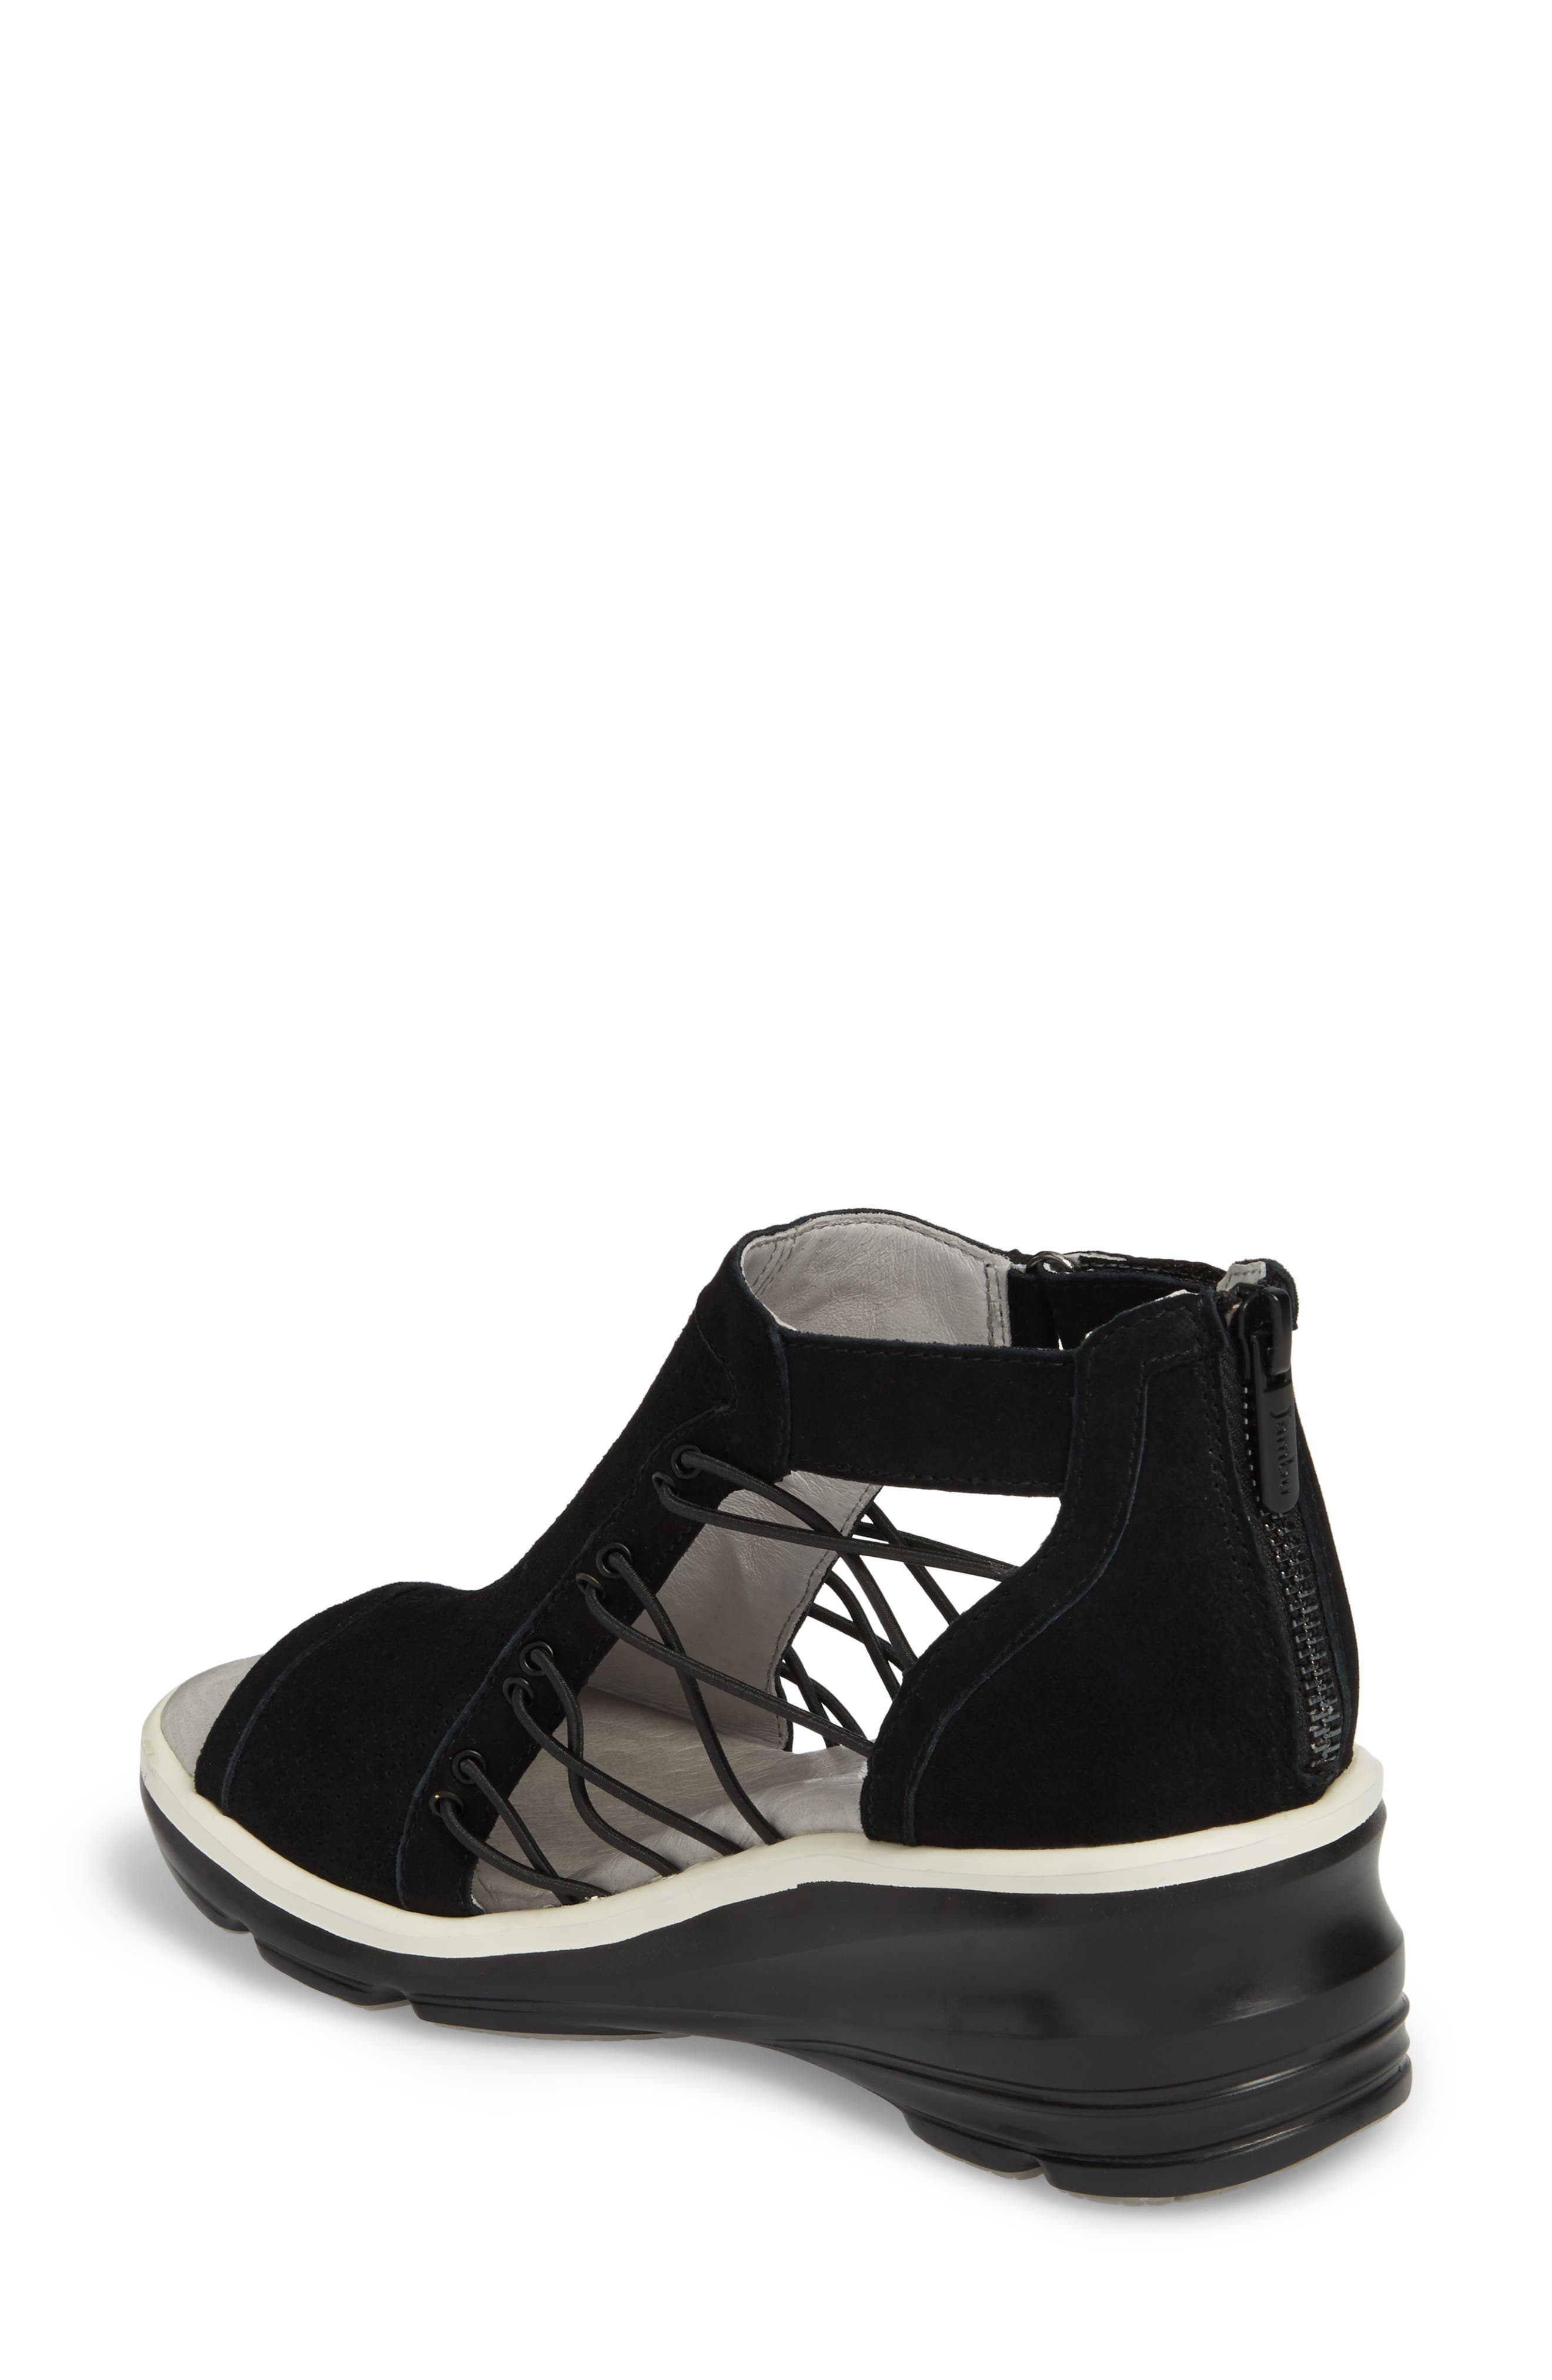 Alternate Image 2  - Jambu Naomi Perforated Wedge Sandal (Women)